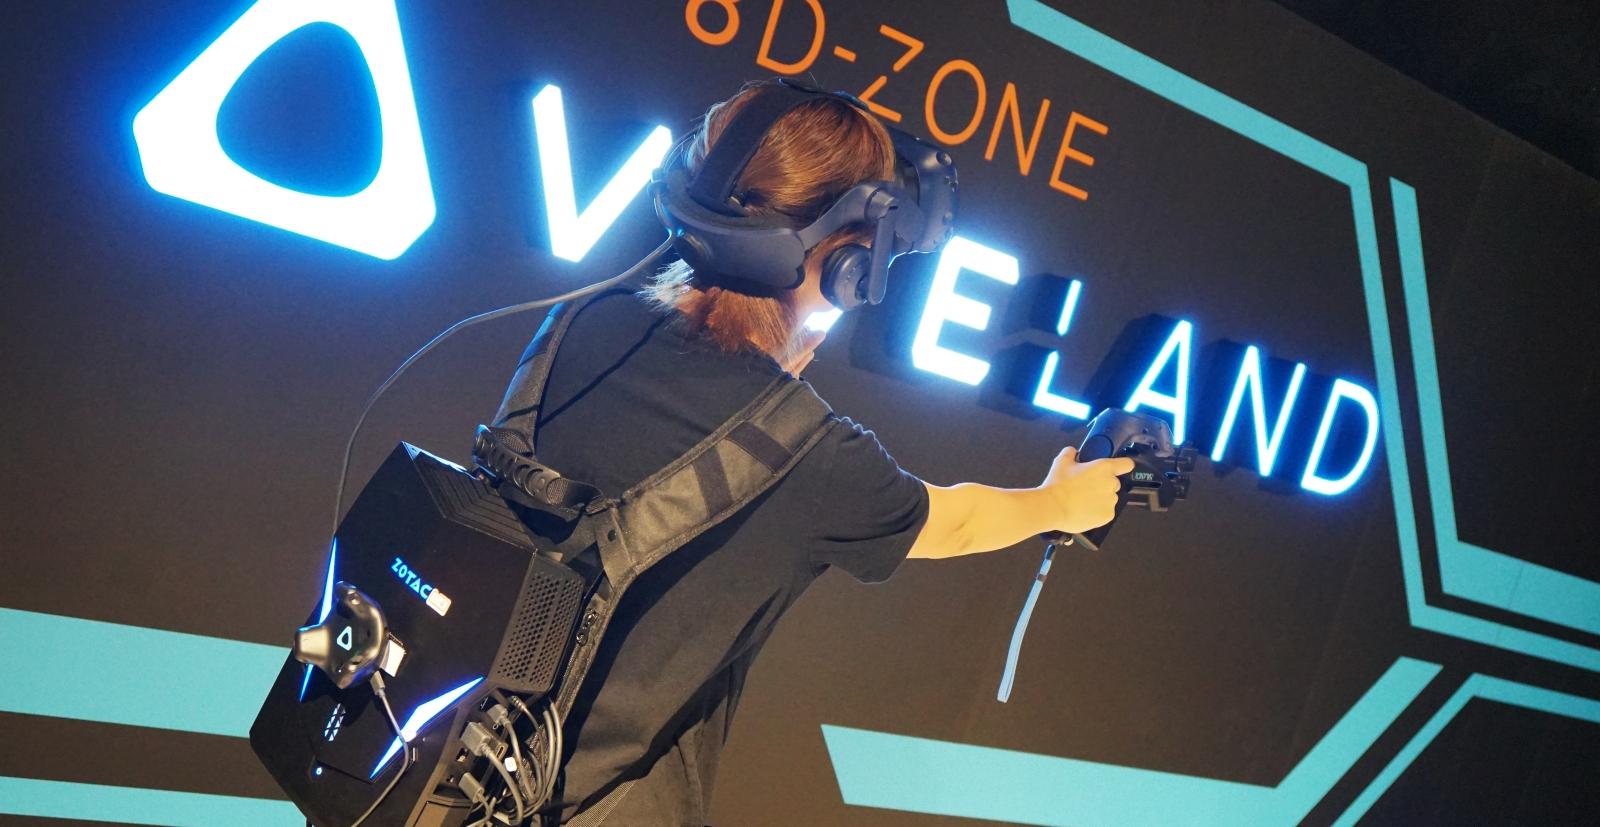 HTC 在台北三創打造新 Vive 四人對戰遊戲,背著 VR 背包更有臨場感